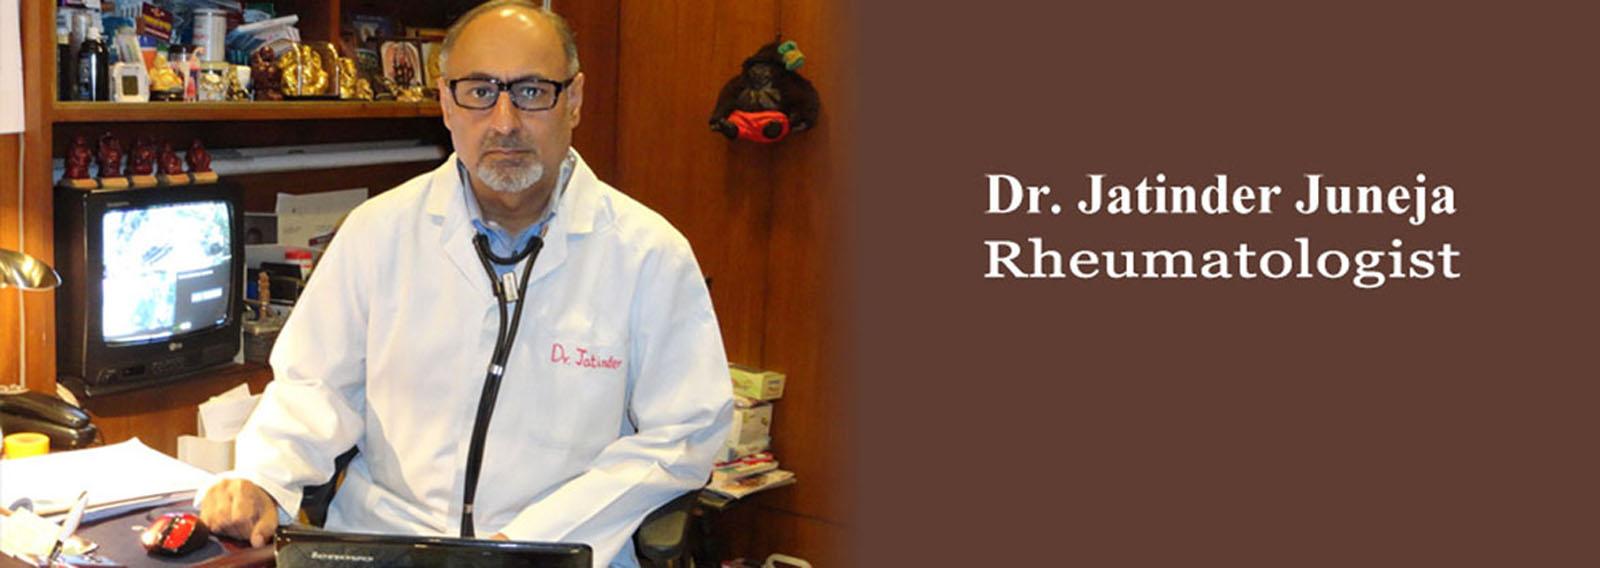 Rheumatologist in Delhi